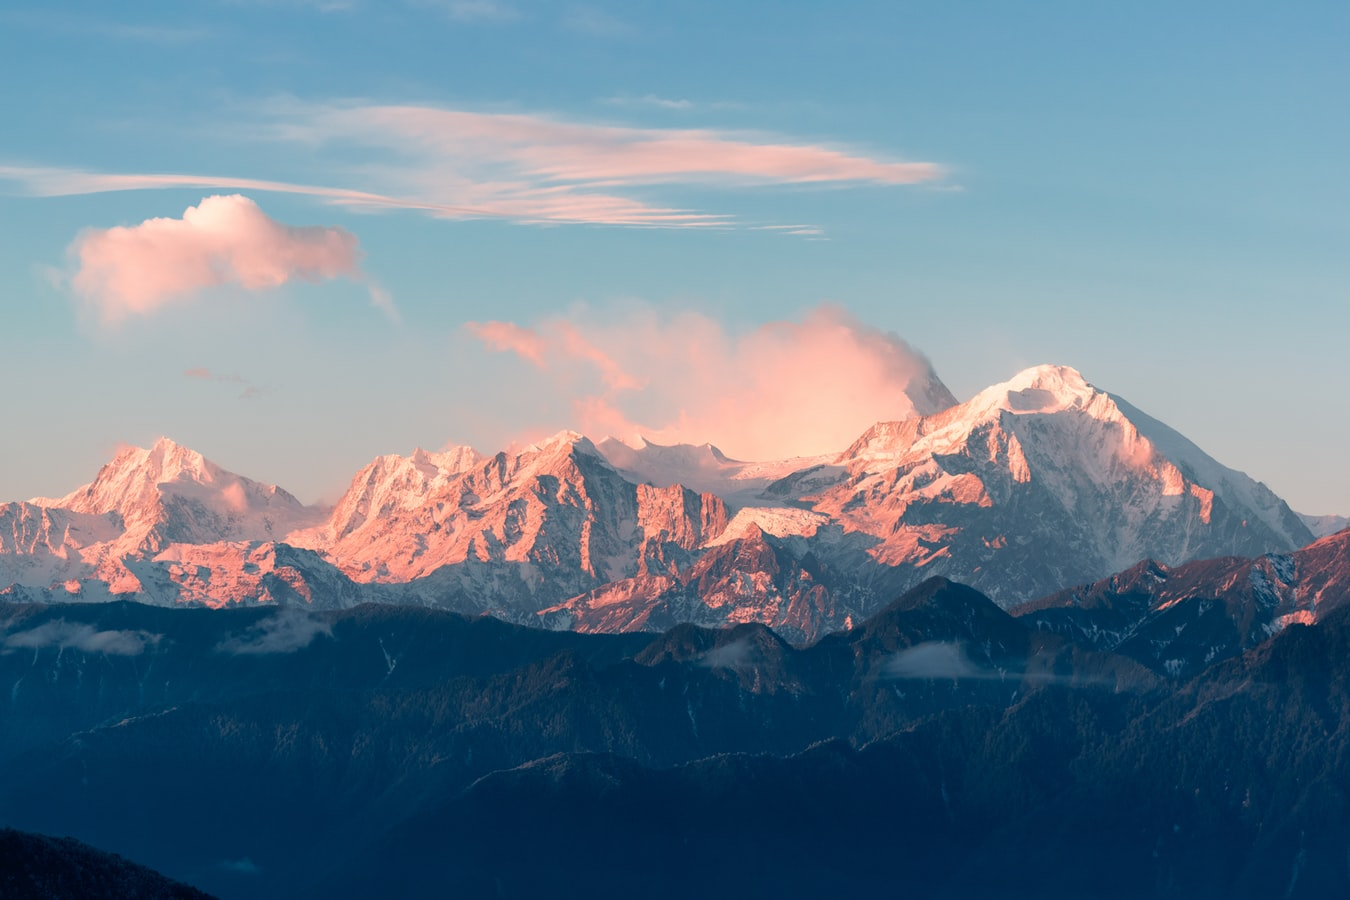 A large mountain range